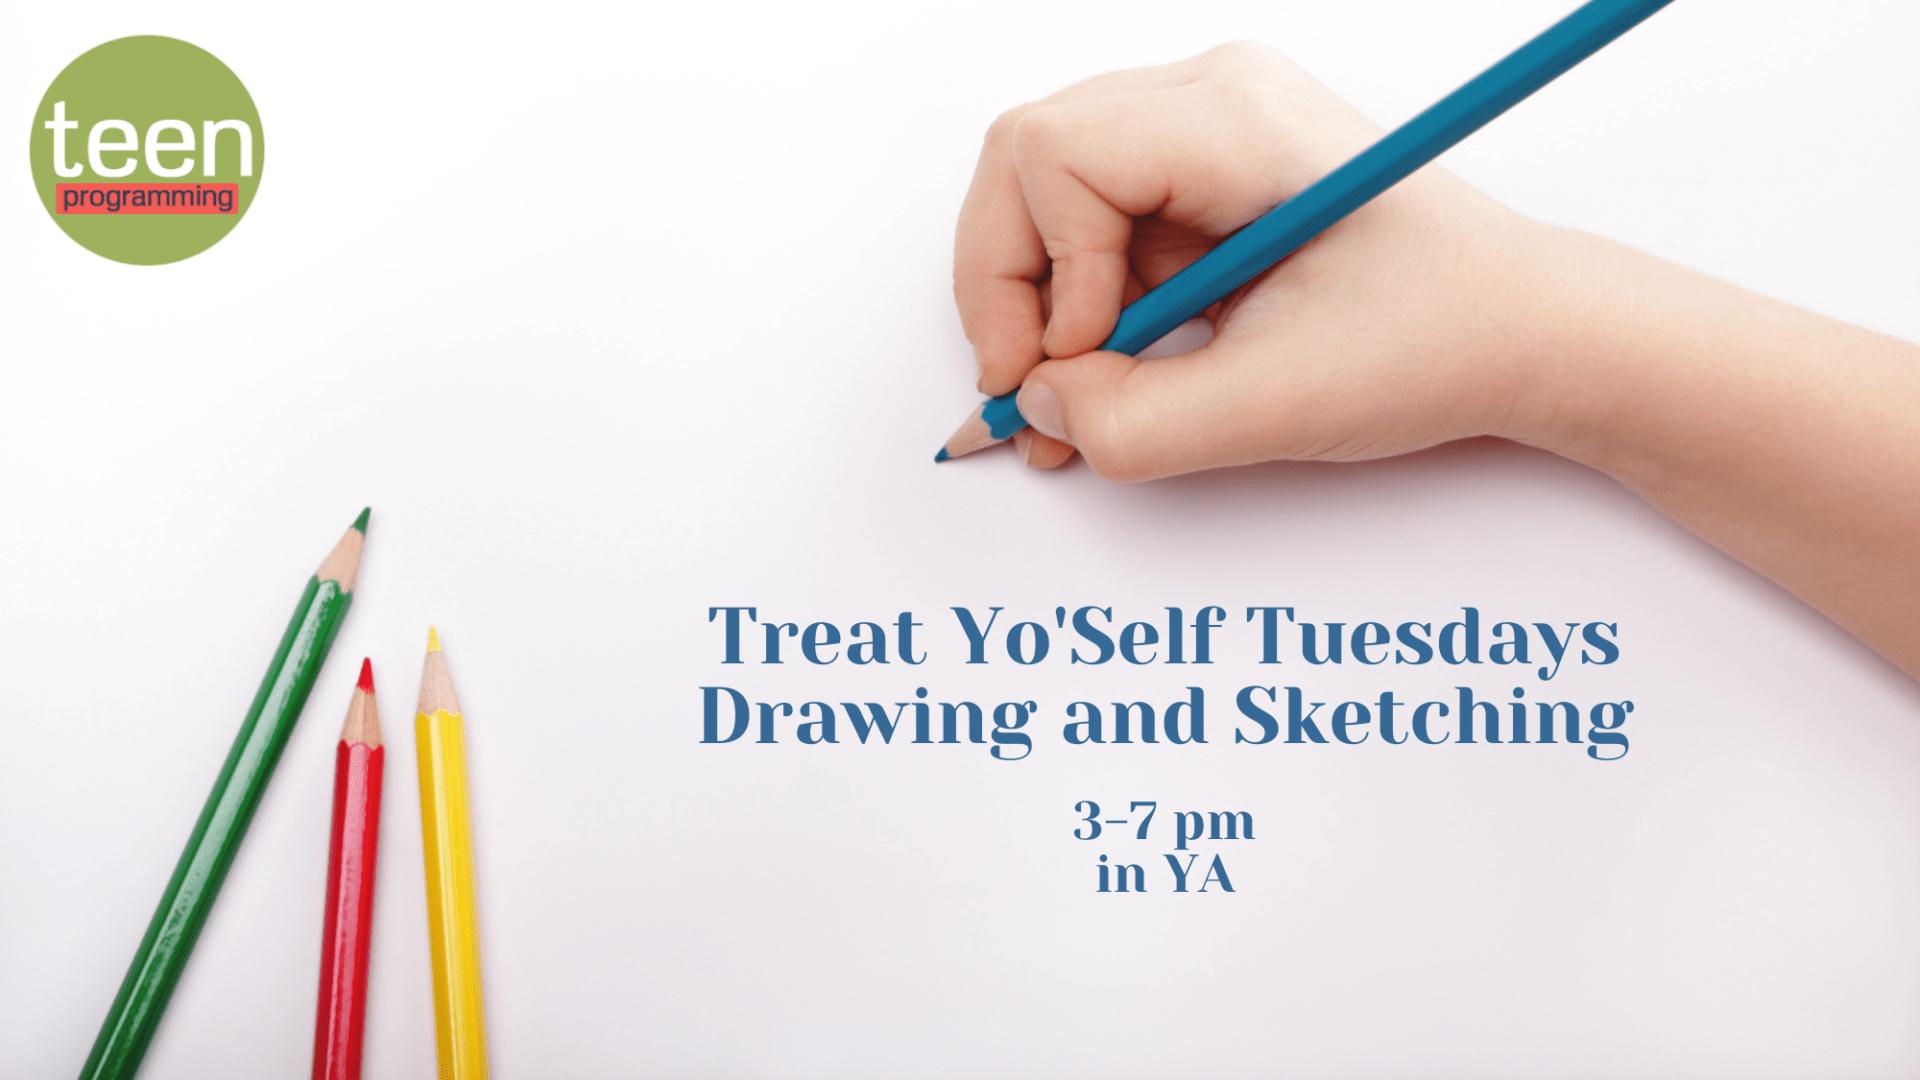 Treat Yo'self Tuesdays – Drawing and Sketching